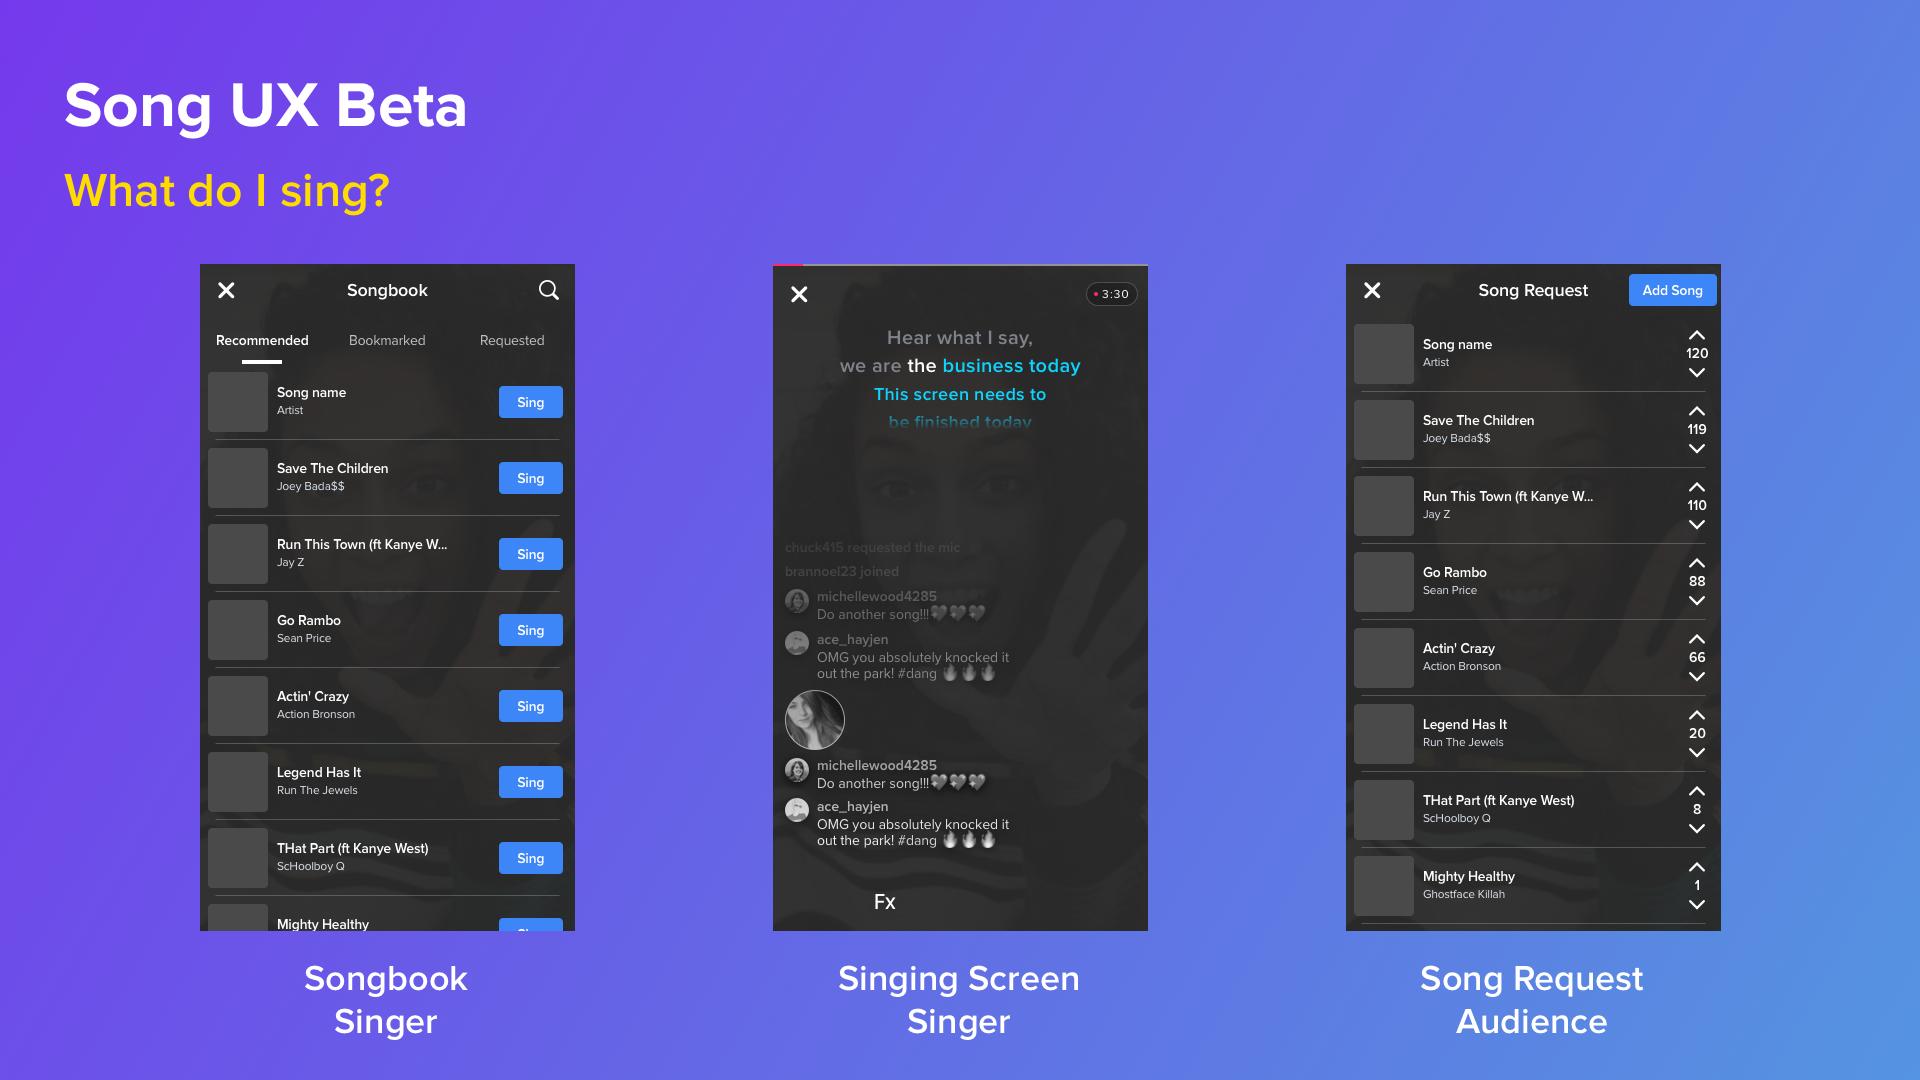 6_Song_UX_Beta.png